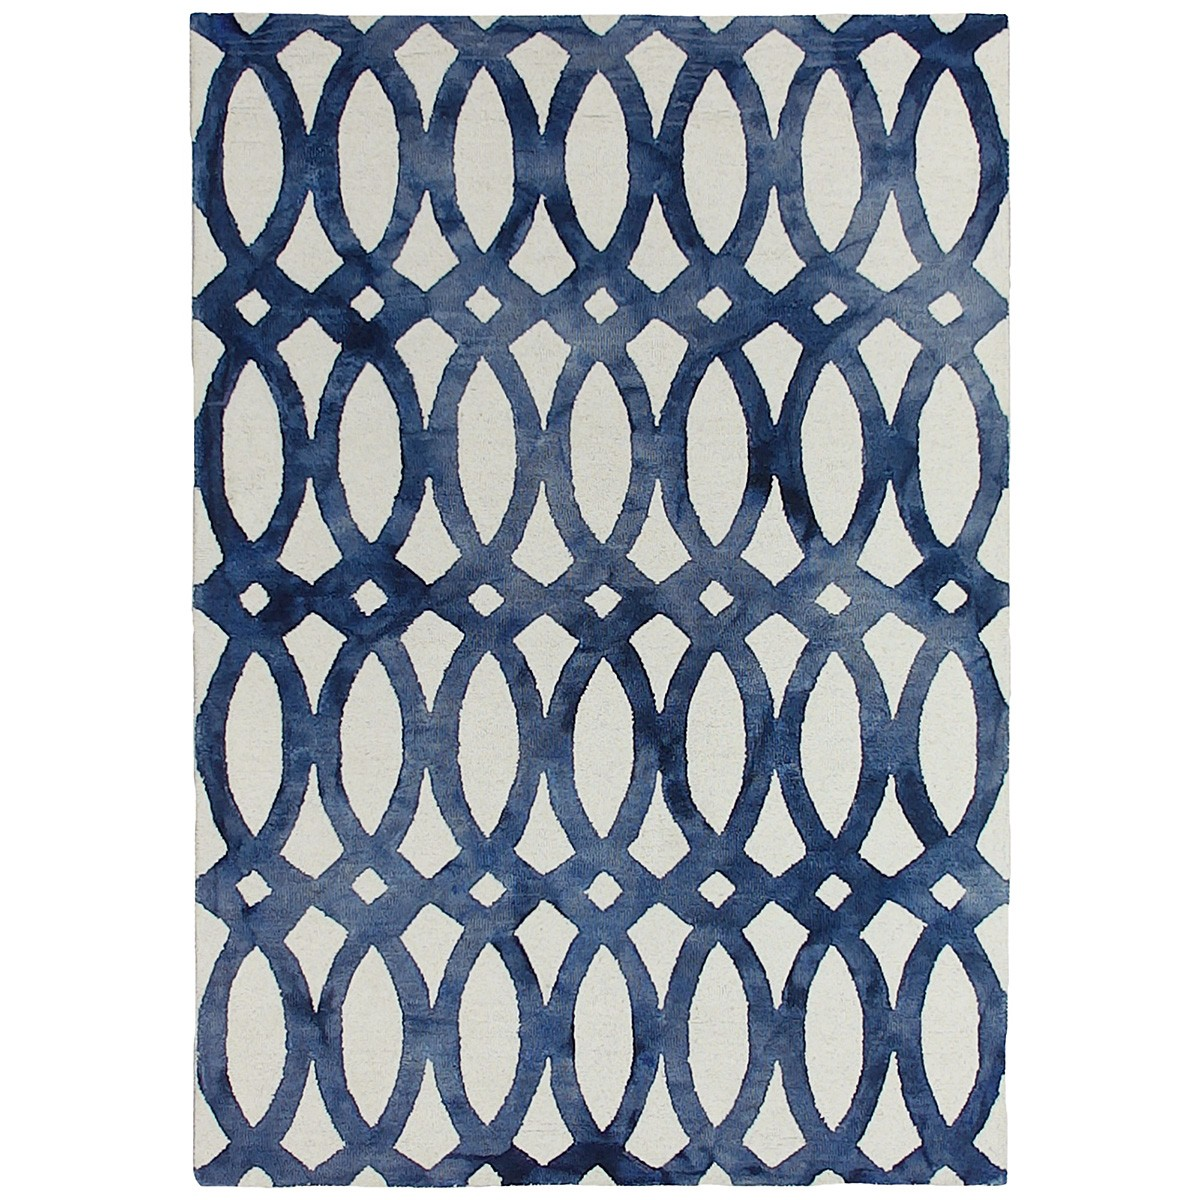 Dip Dye Hand Tufted Wool Rug, 160x230cm, Navy